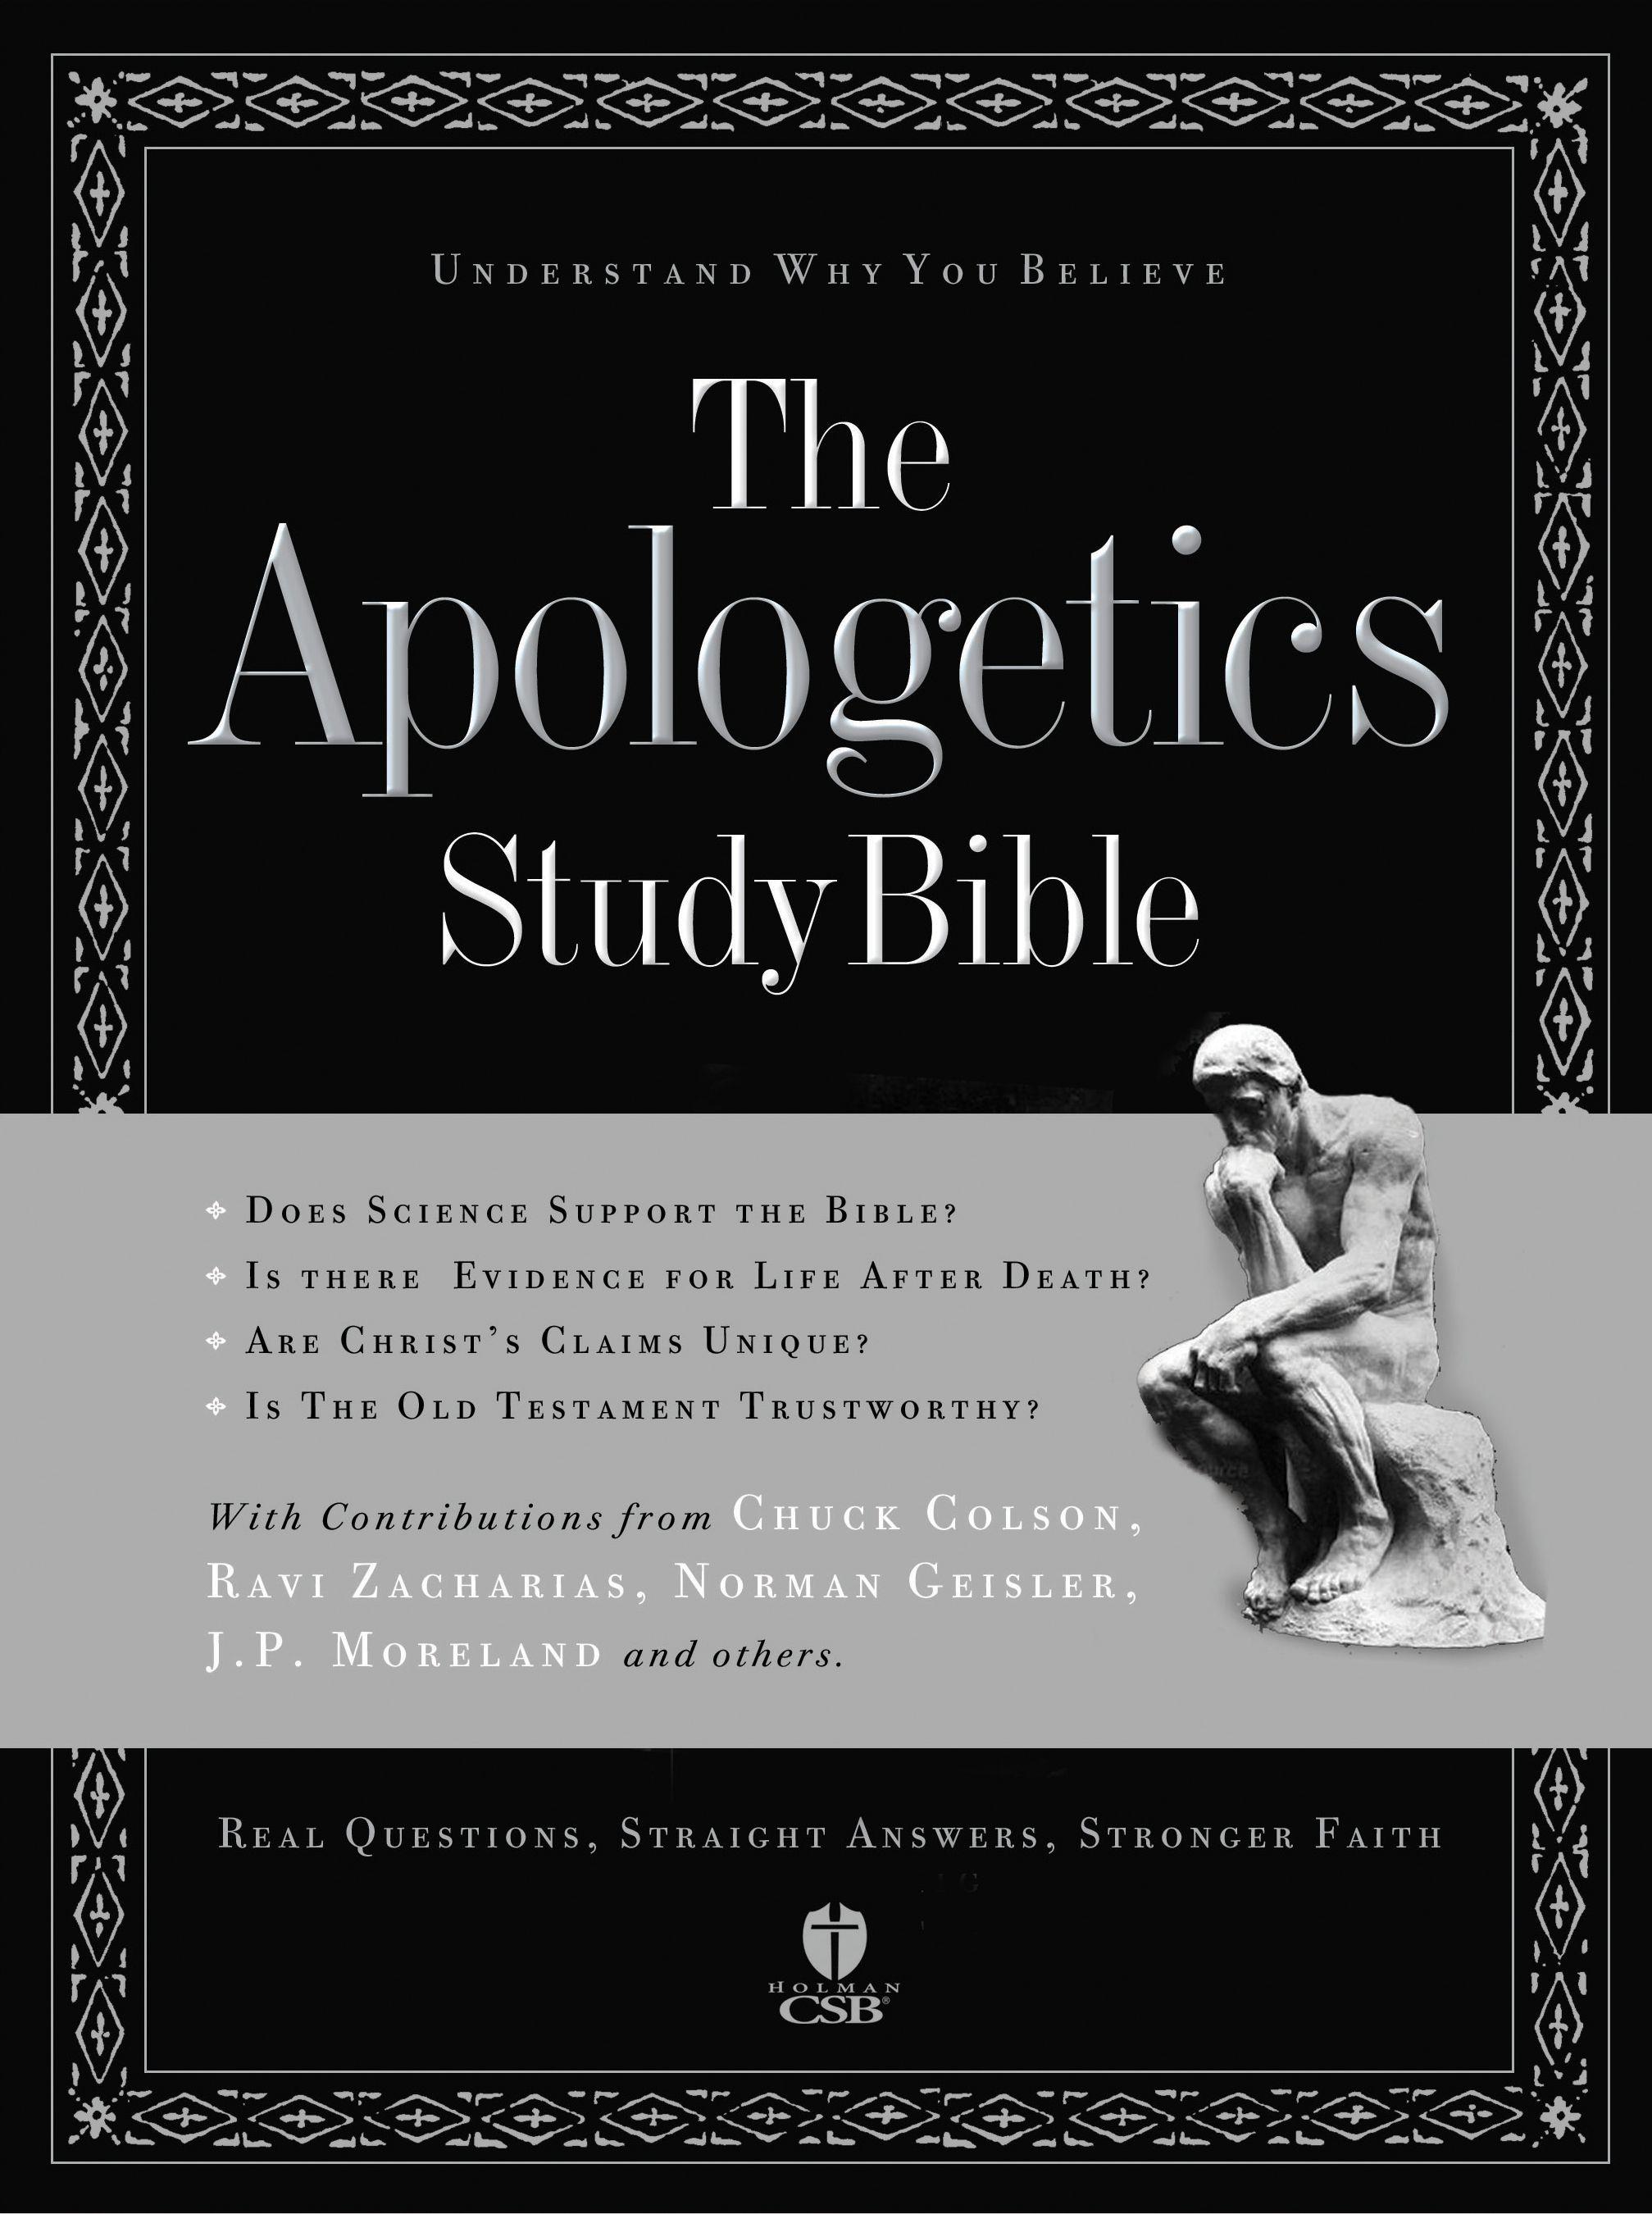 The Apologetics Study Bible Apologetics, Bible study